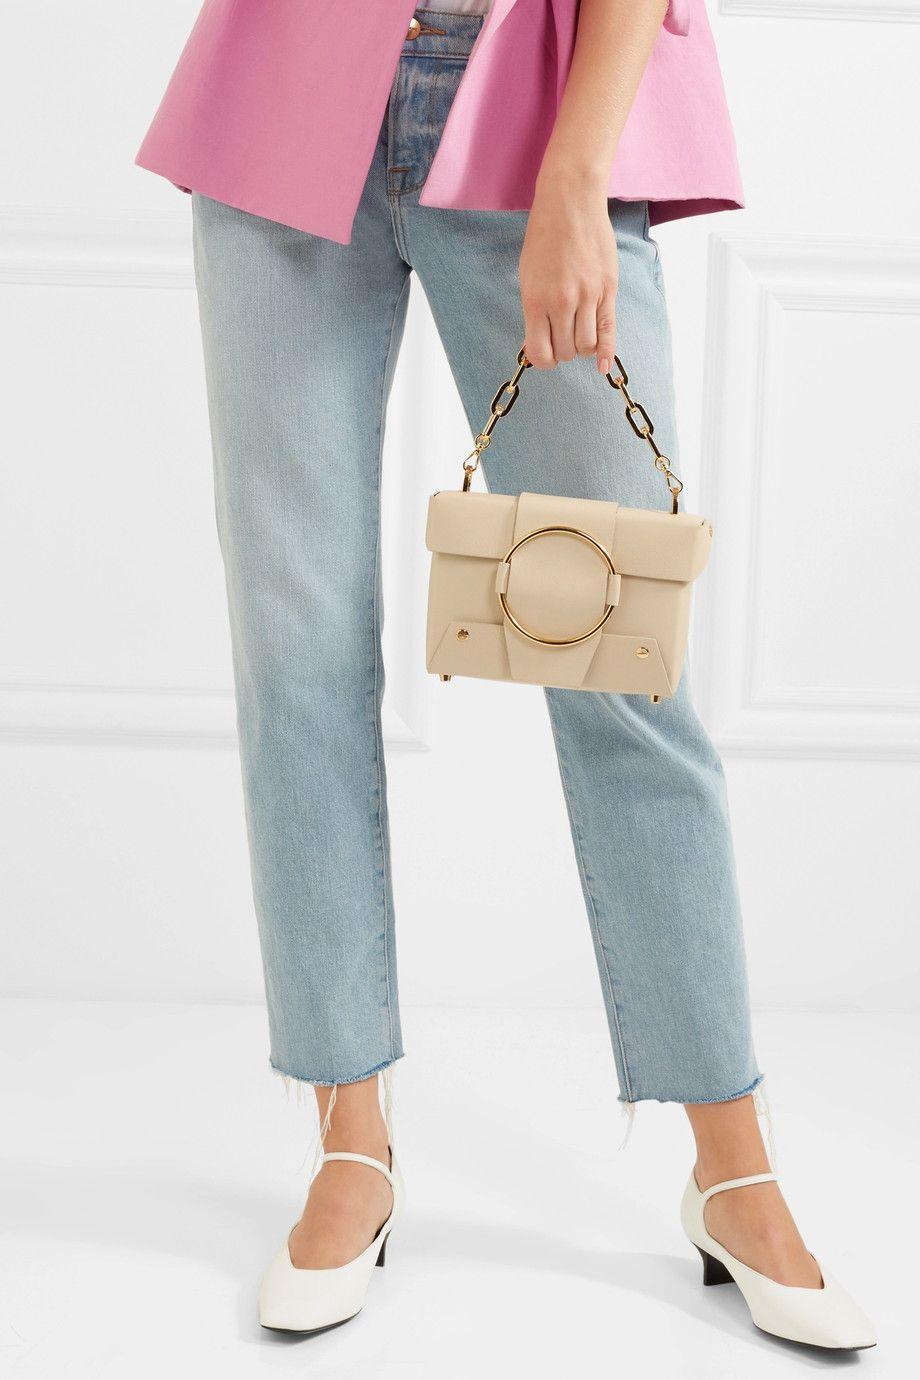 A Net Bag Leather Porter Sac Shoulder Asher Small Yuzefi com wRgYOq